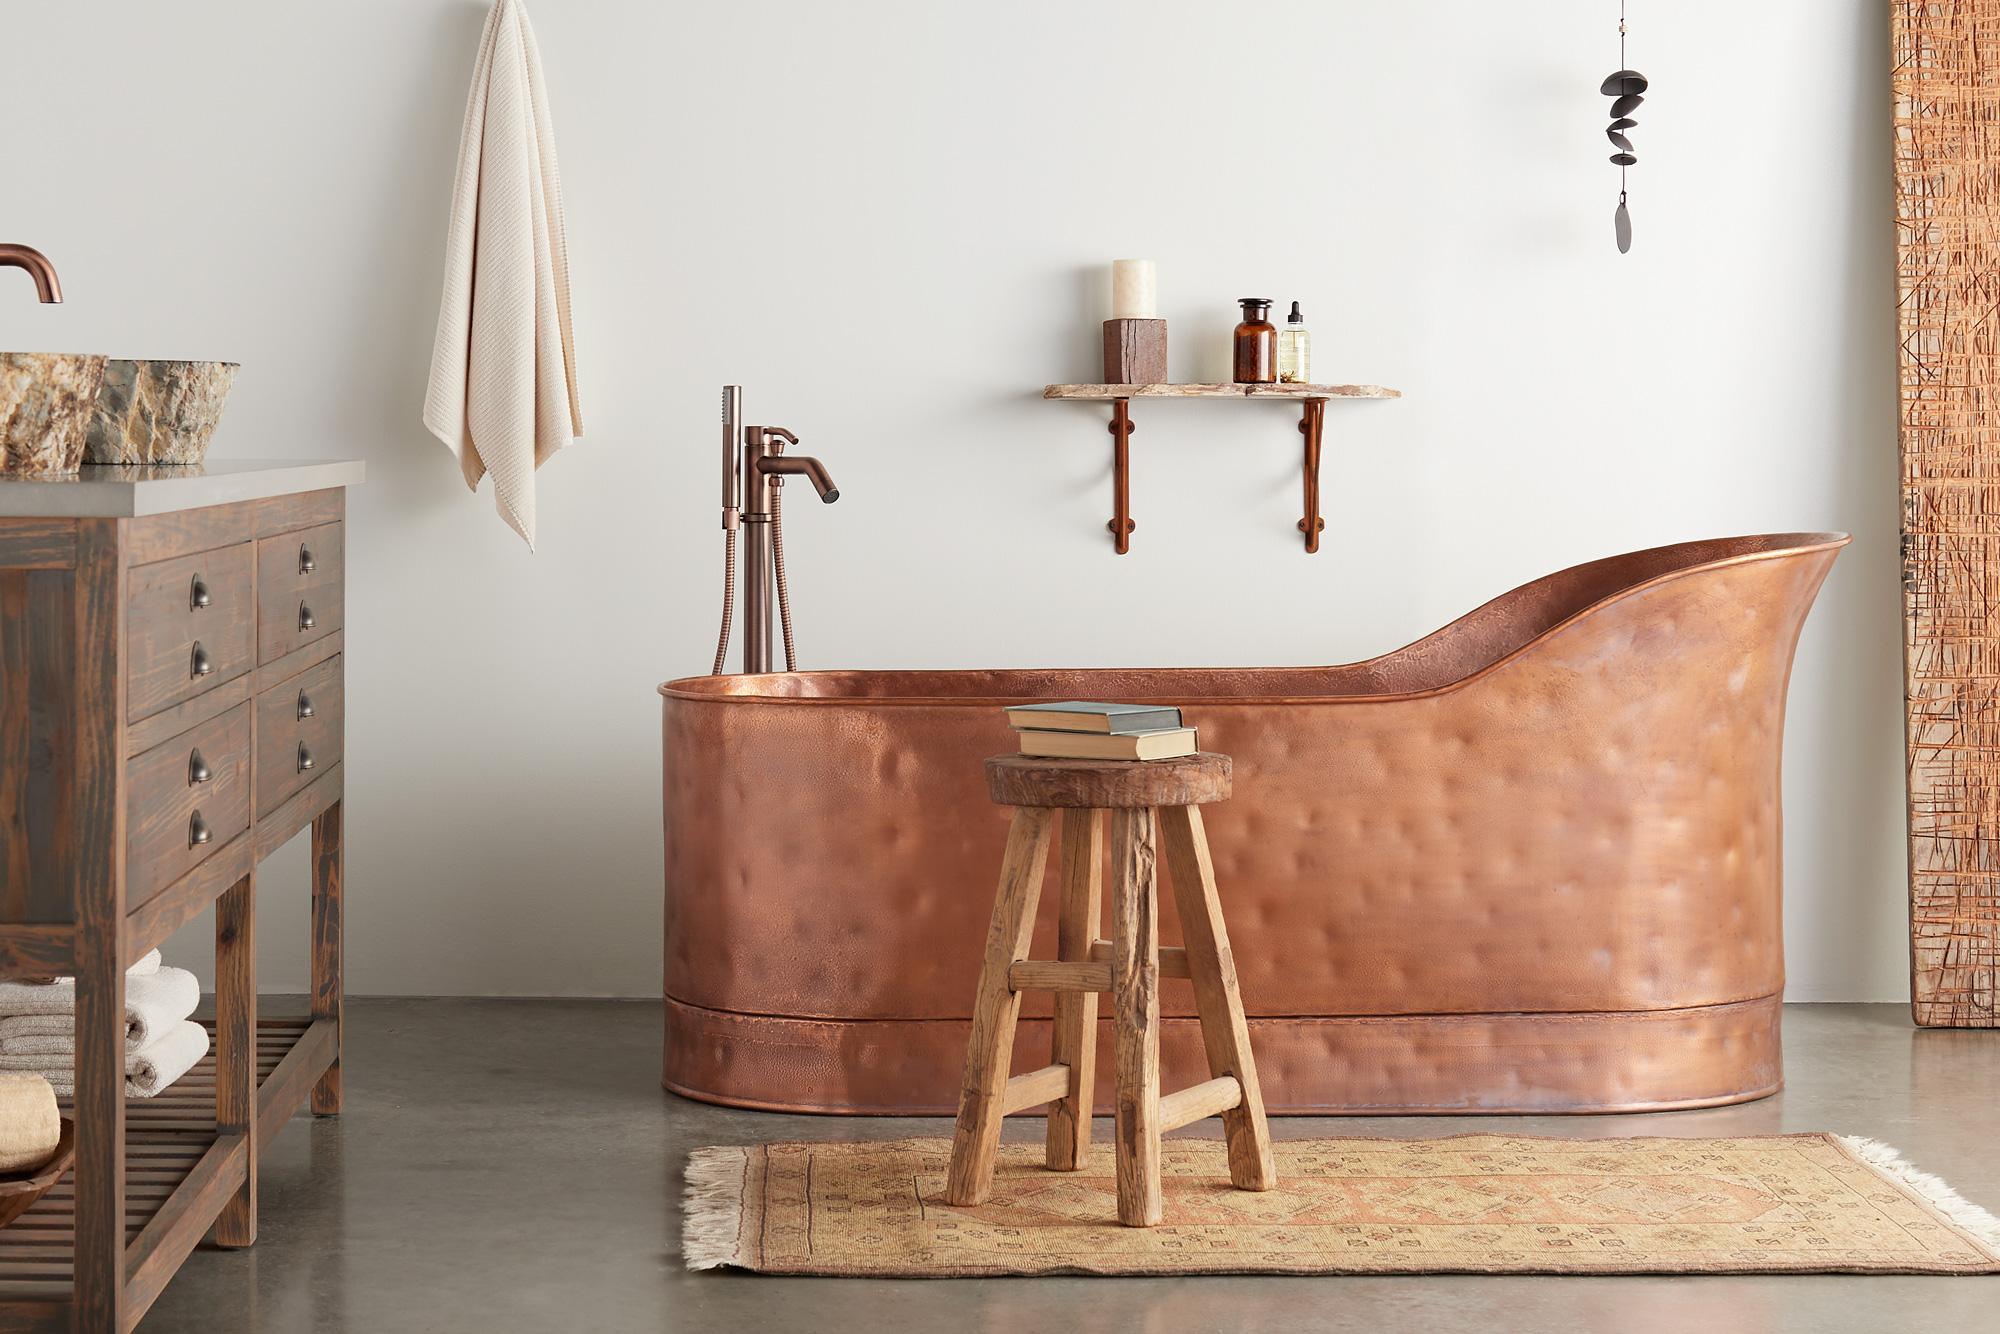 sixtysix signature hardware wabi sabi full room tub